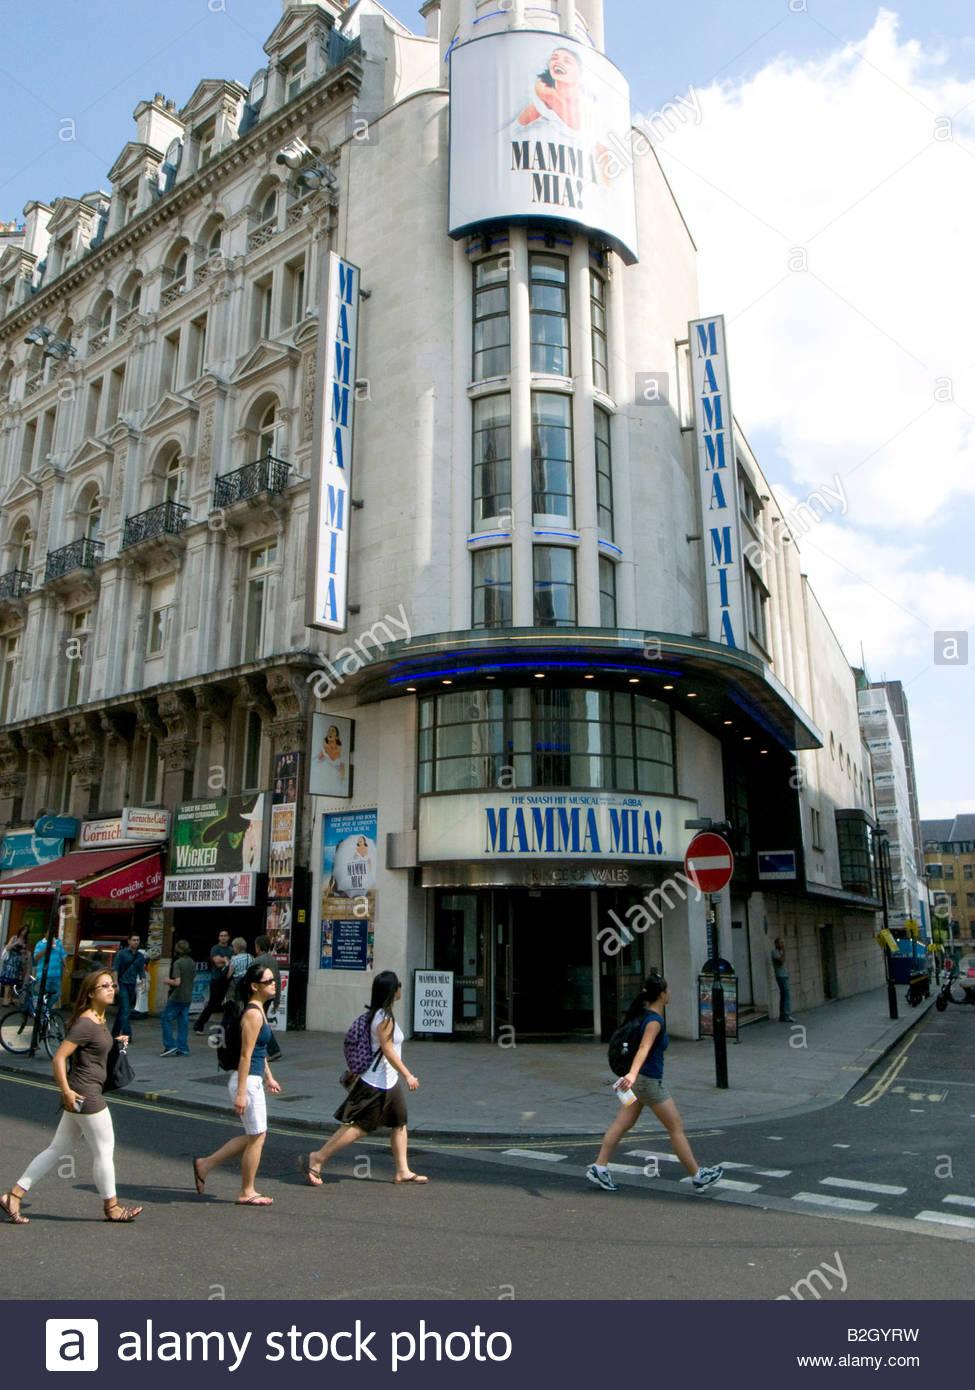 Women crossing the street in London West End - Stock Image